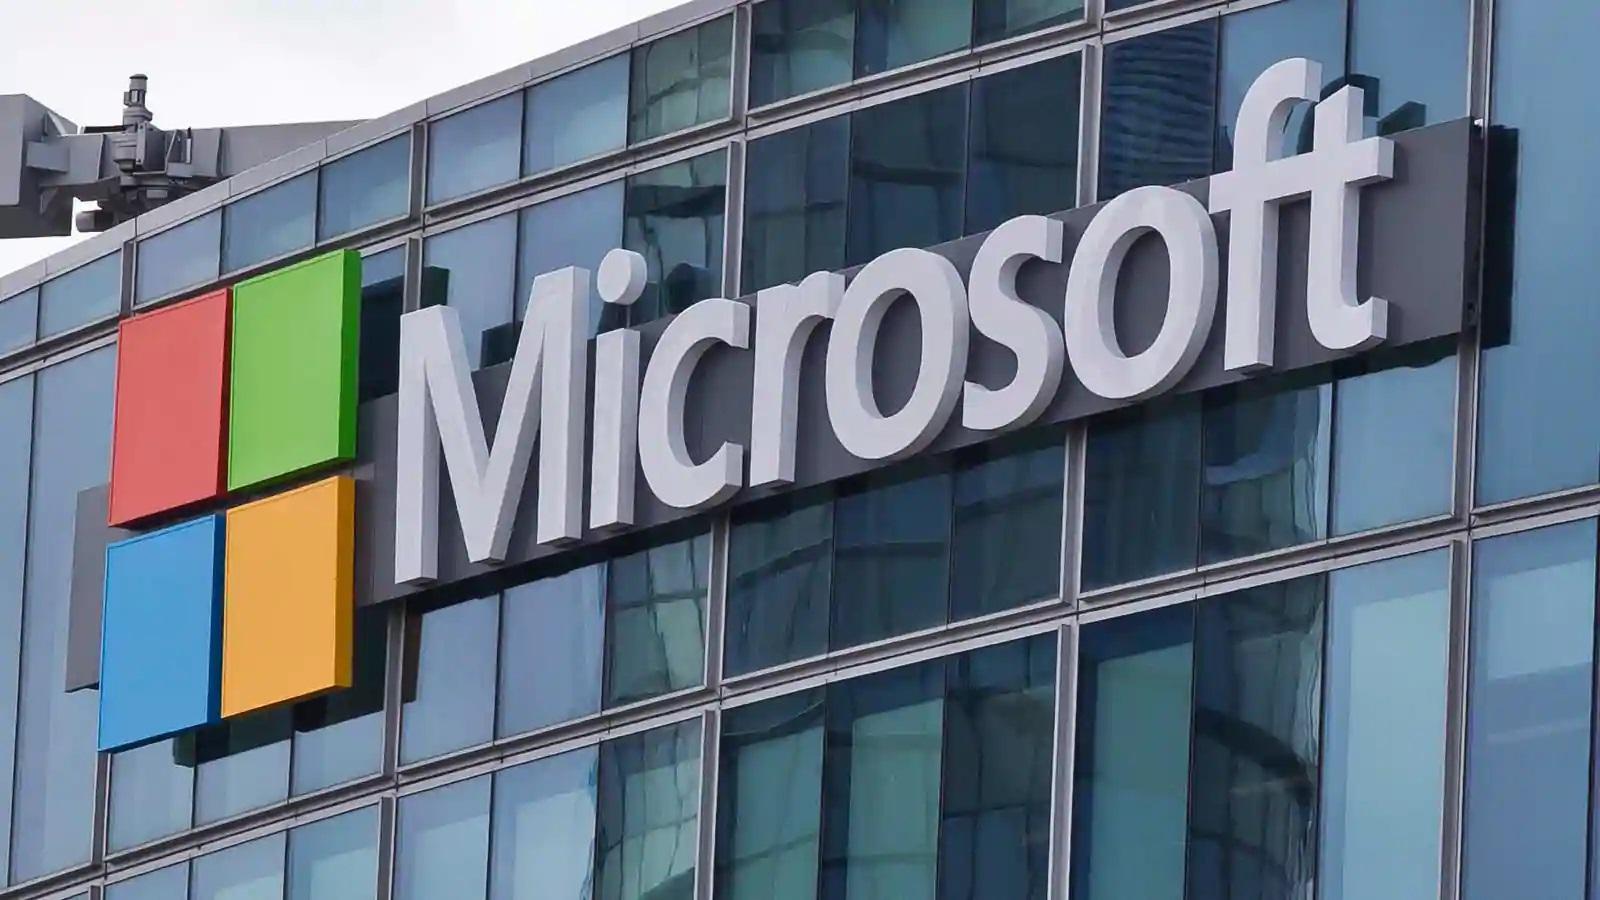 MS - سرمایه گذاری 1 میلیارد دلاری کمپانی مایکروسافت در یونان